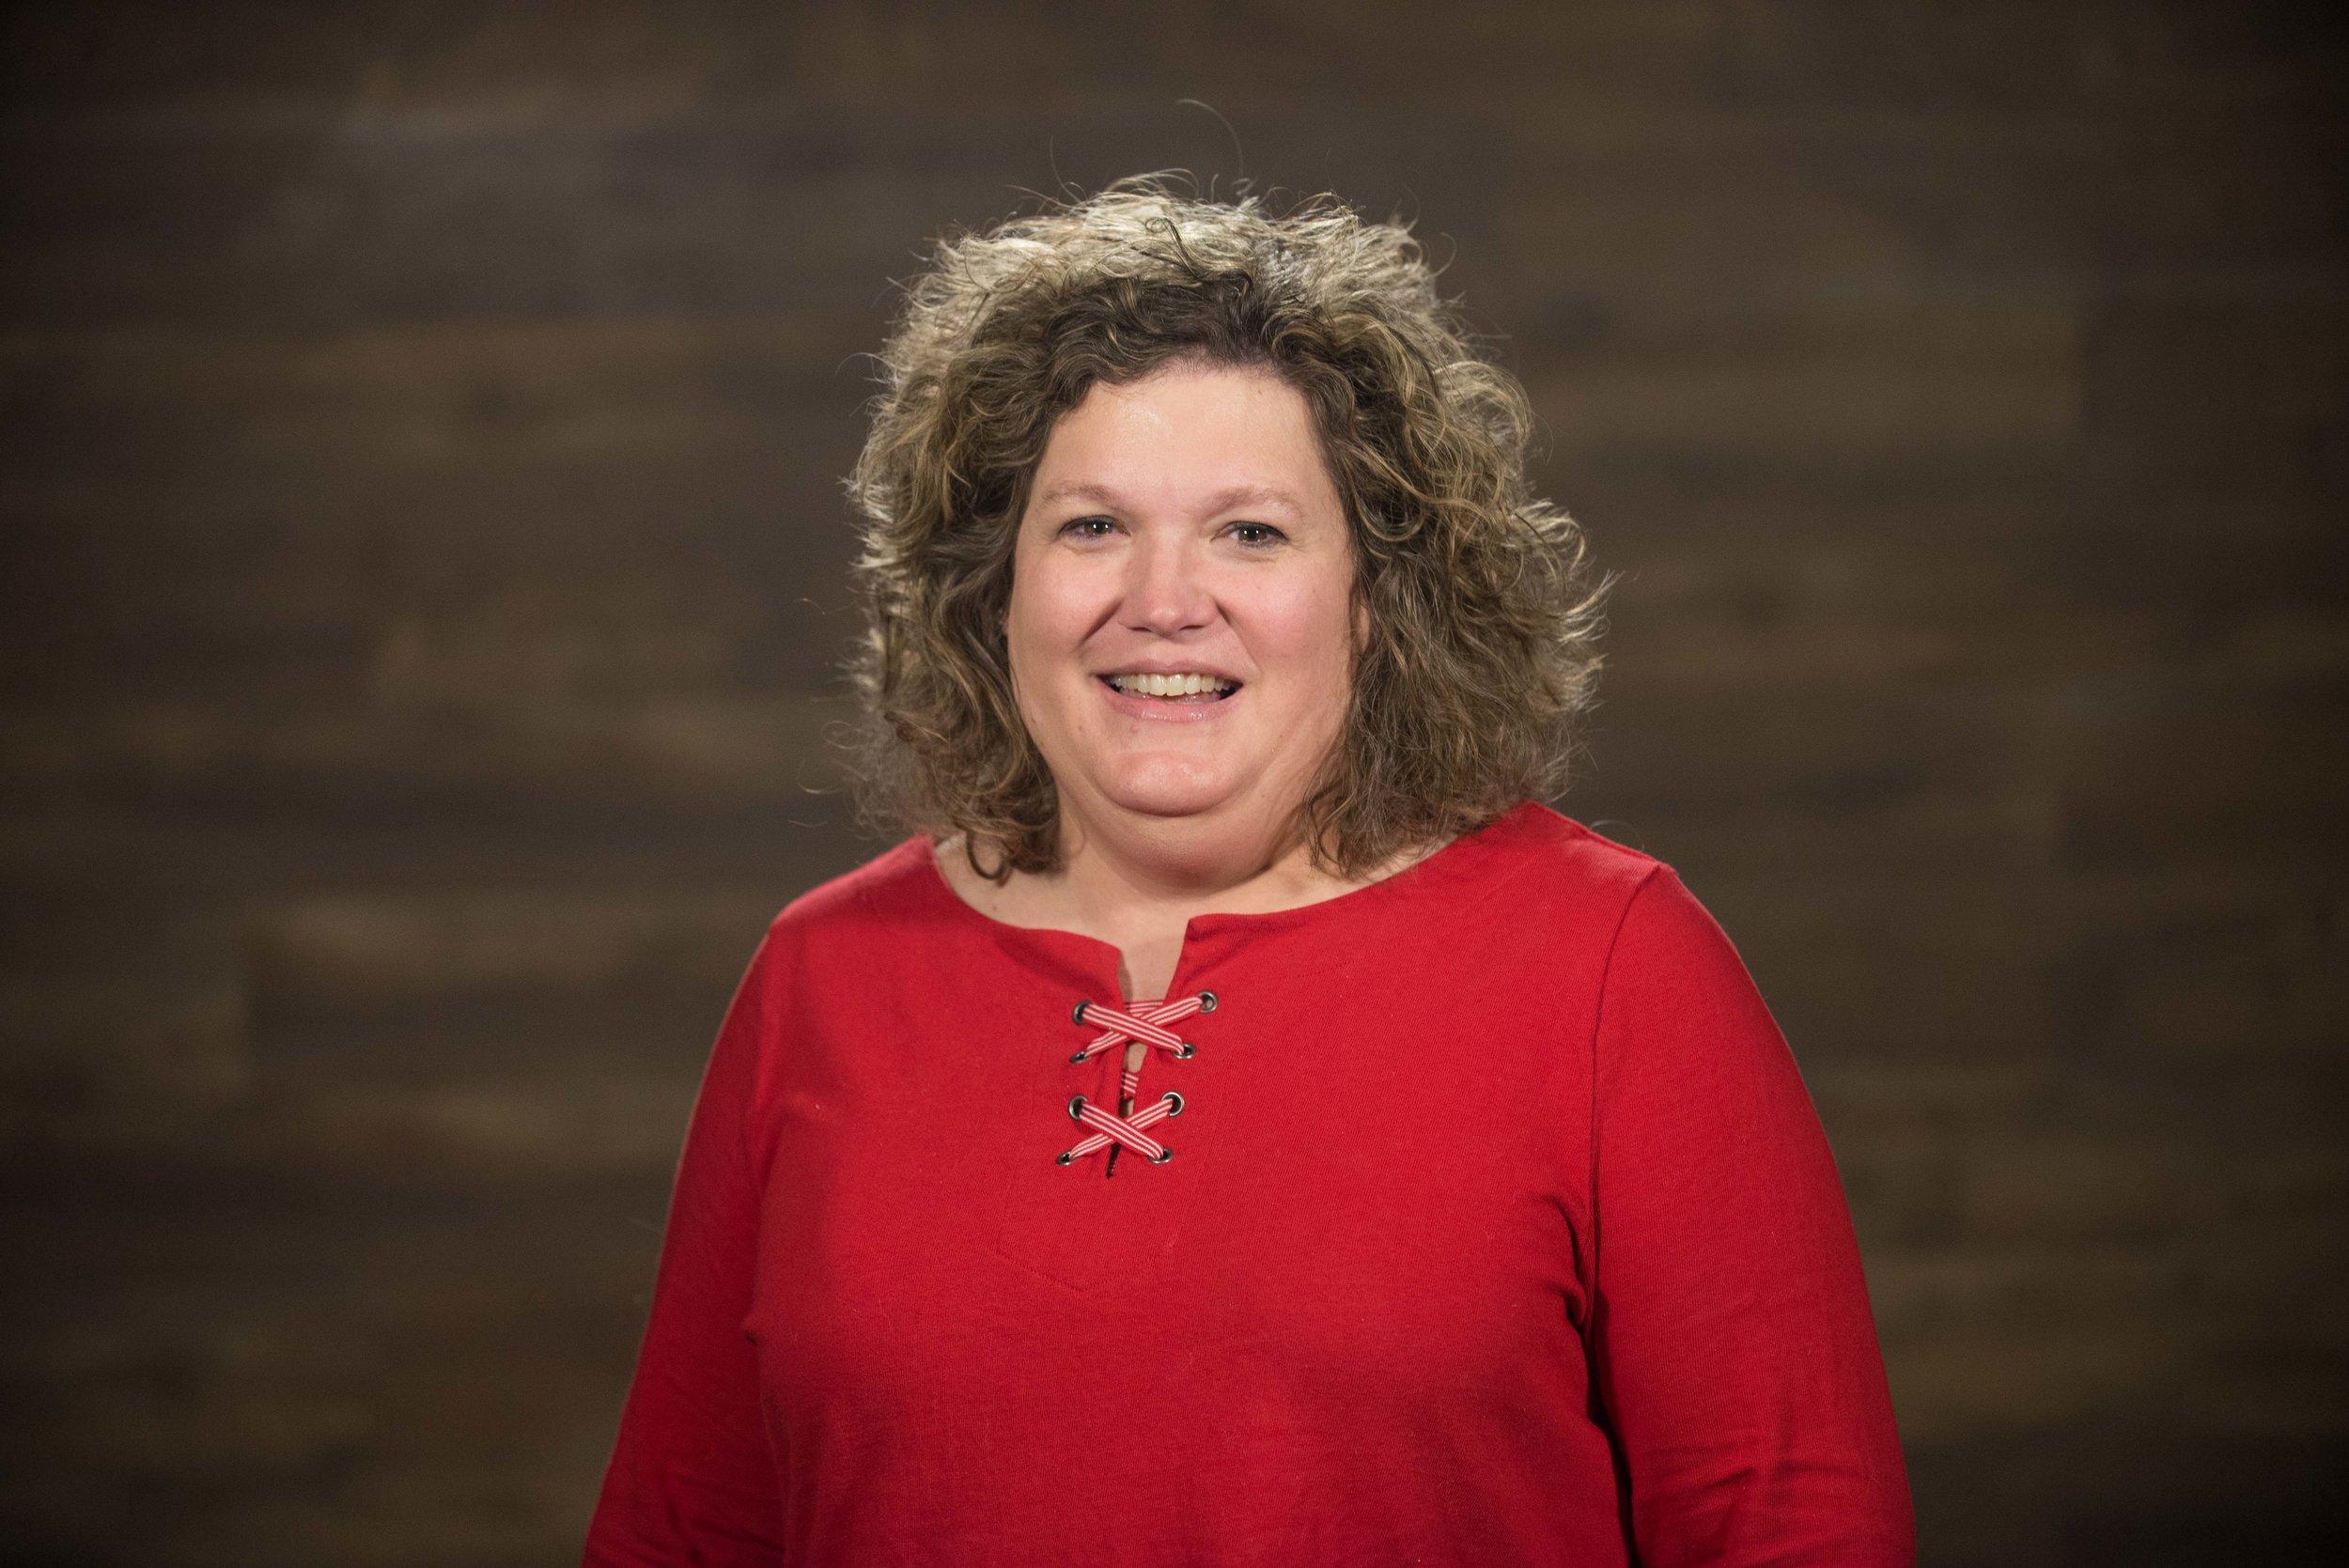 Carla Smith, Connections Preschool Director - preschool@foresthills.org919-899-6869